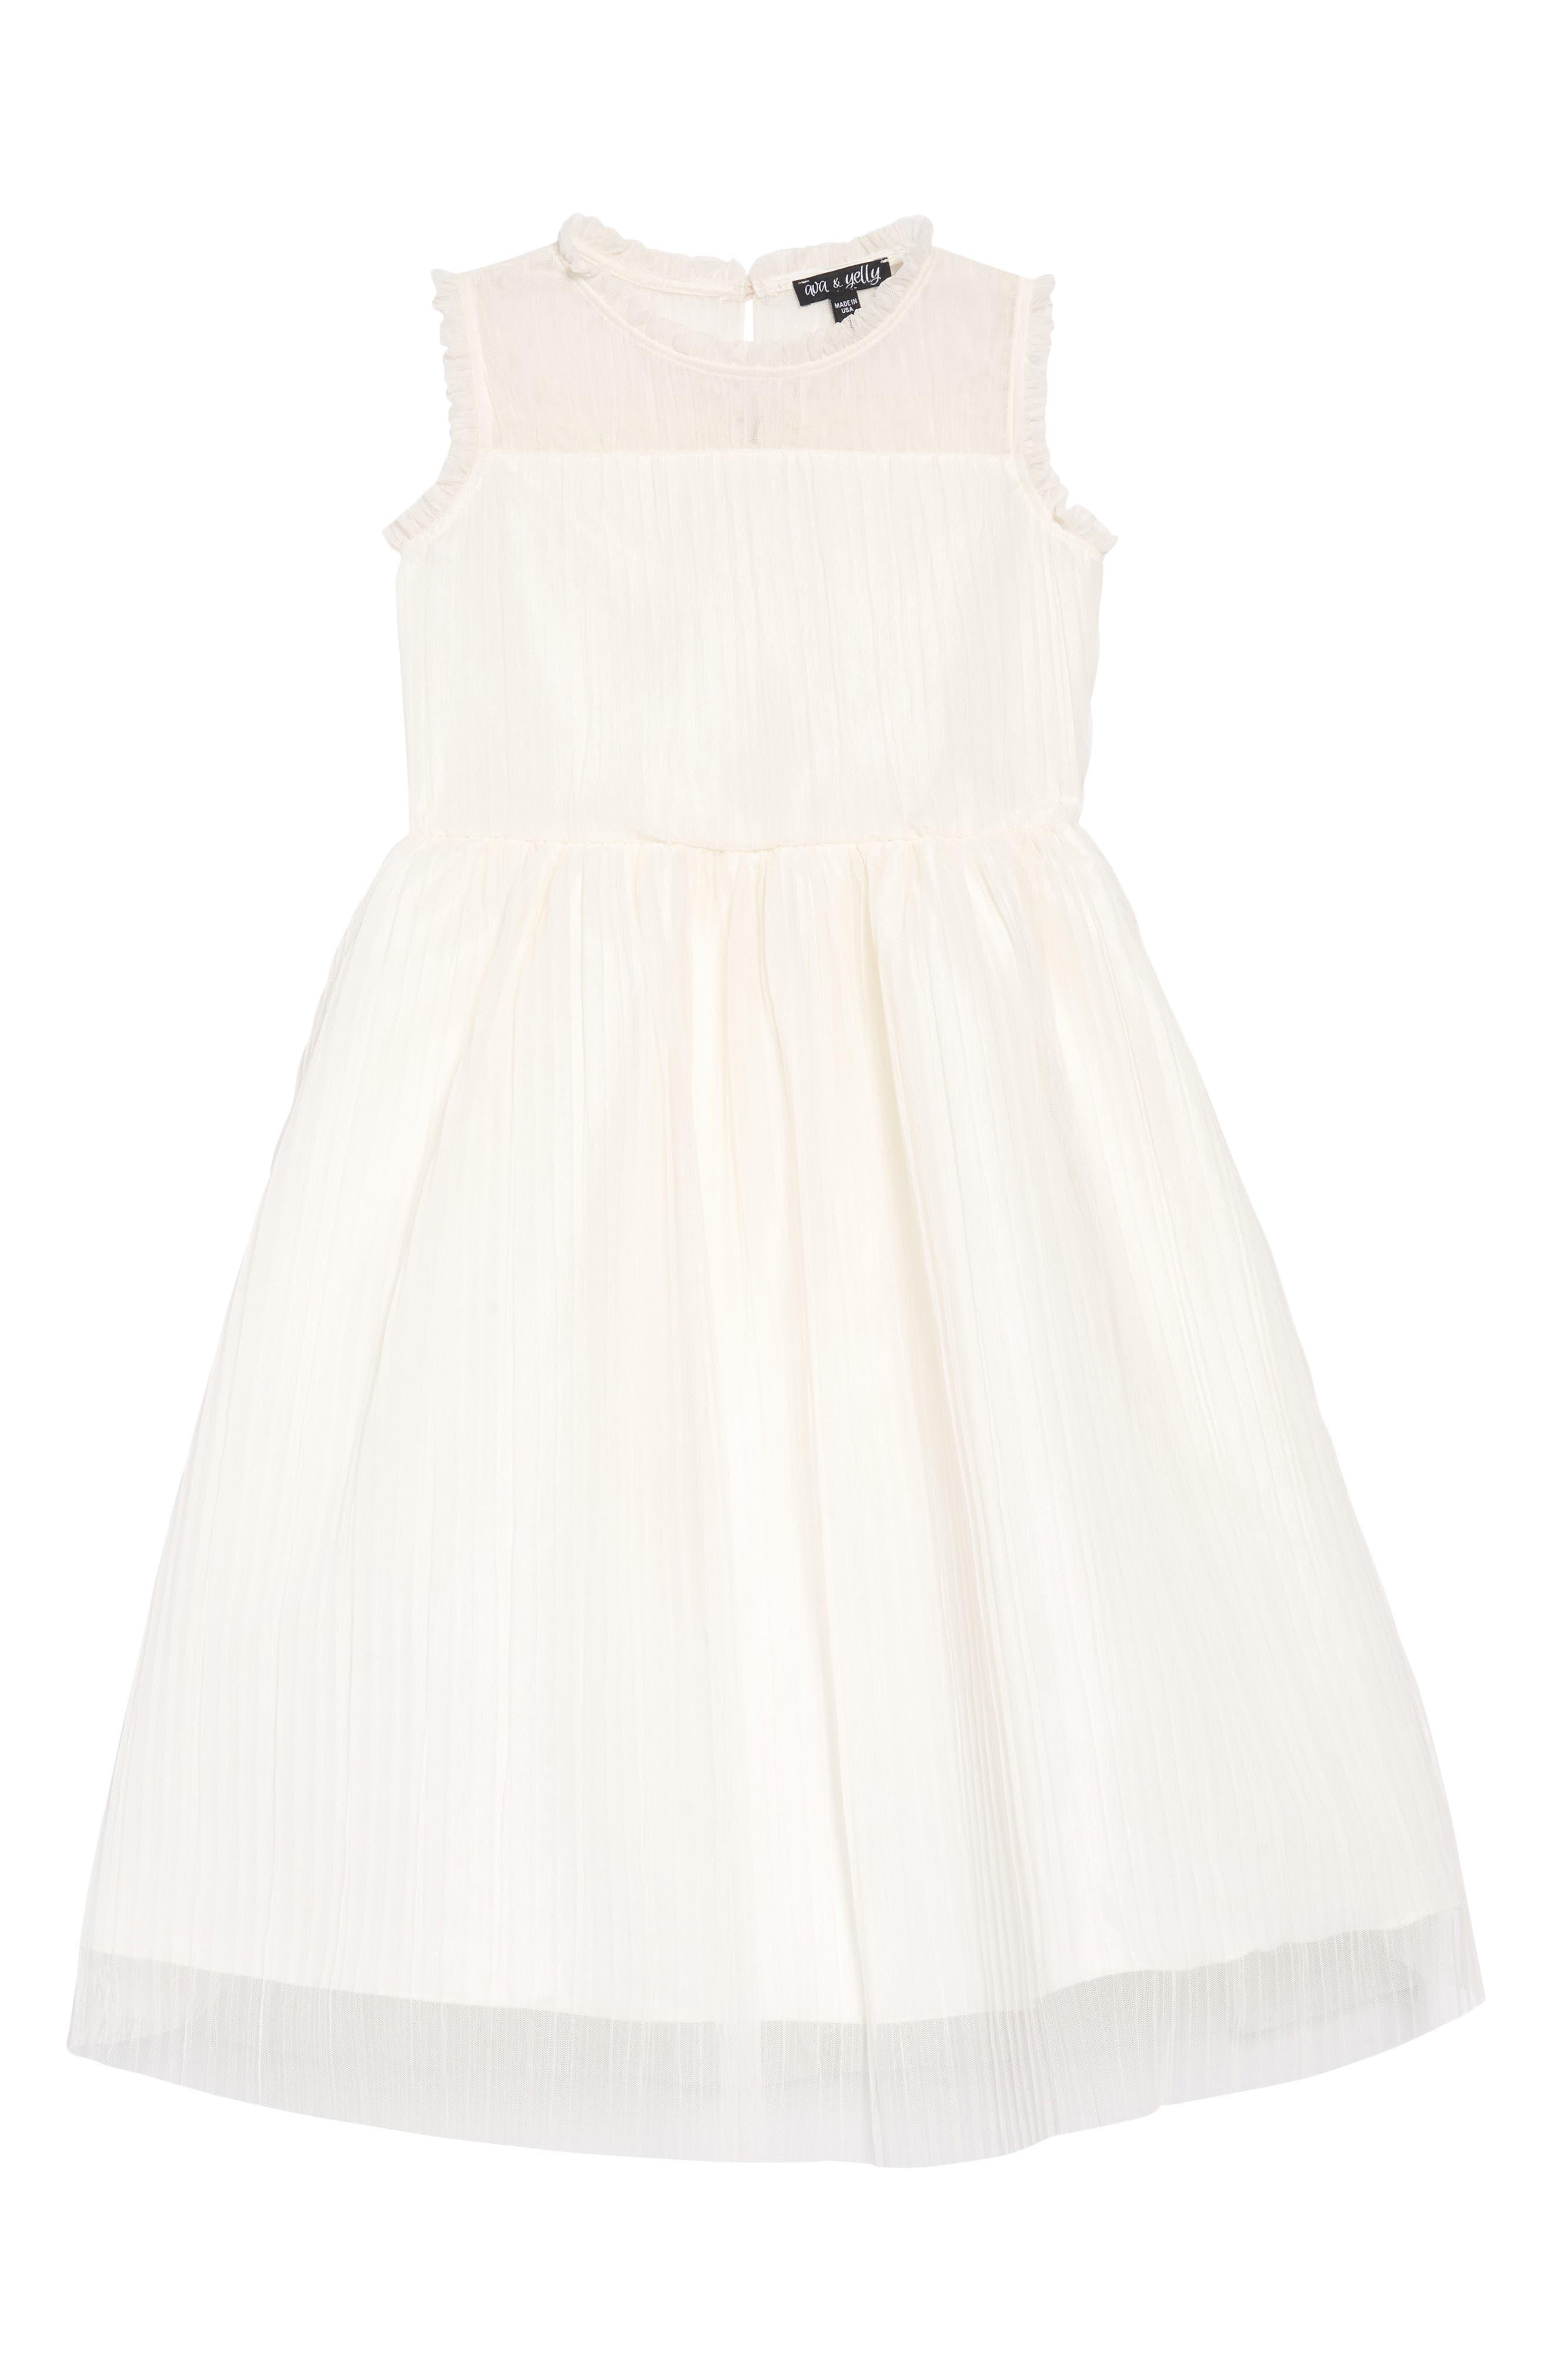 AVA & YELLY Plissé Mesh Dress, Main, color, IVORY